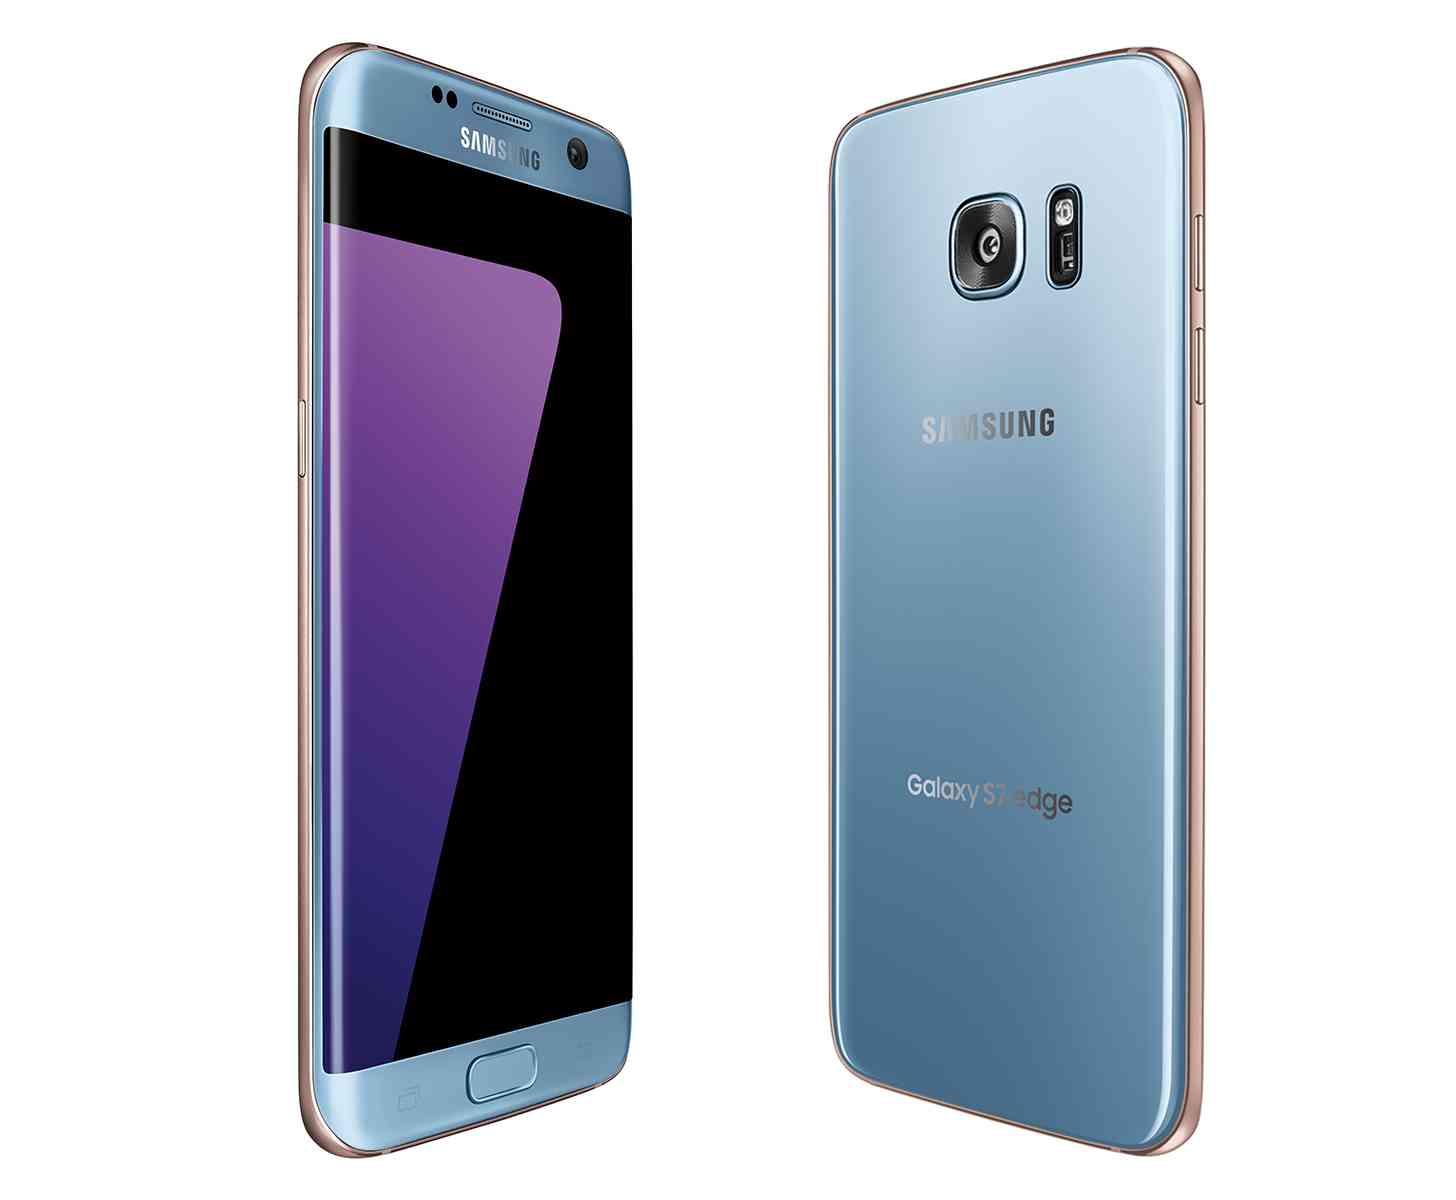 Blue Coral Samsung Galaxy S7 edge official